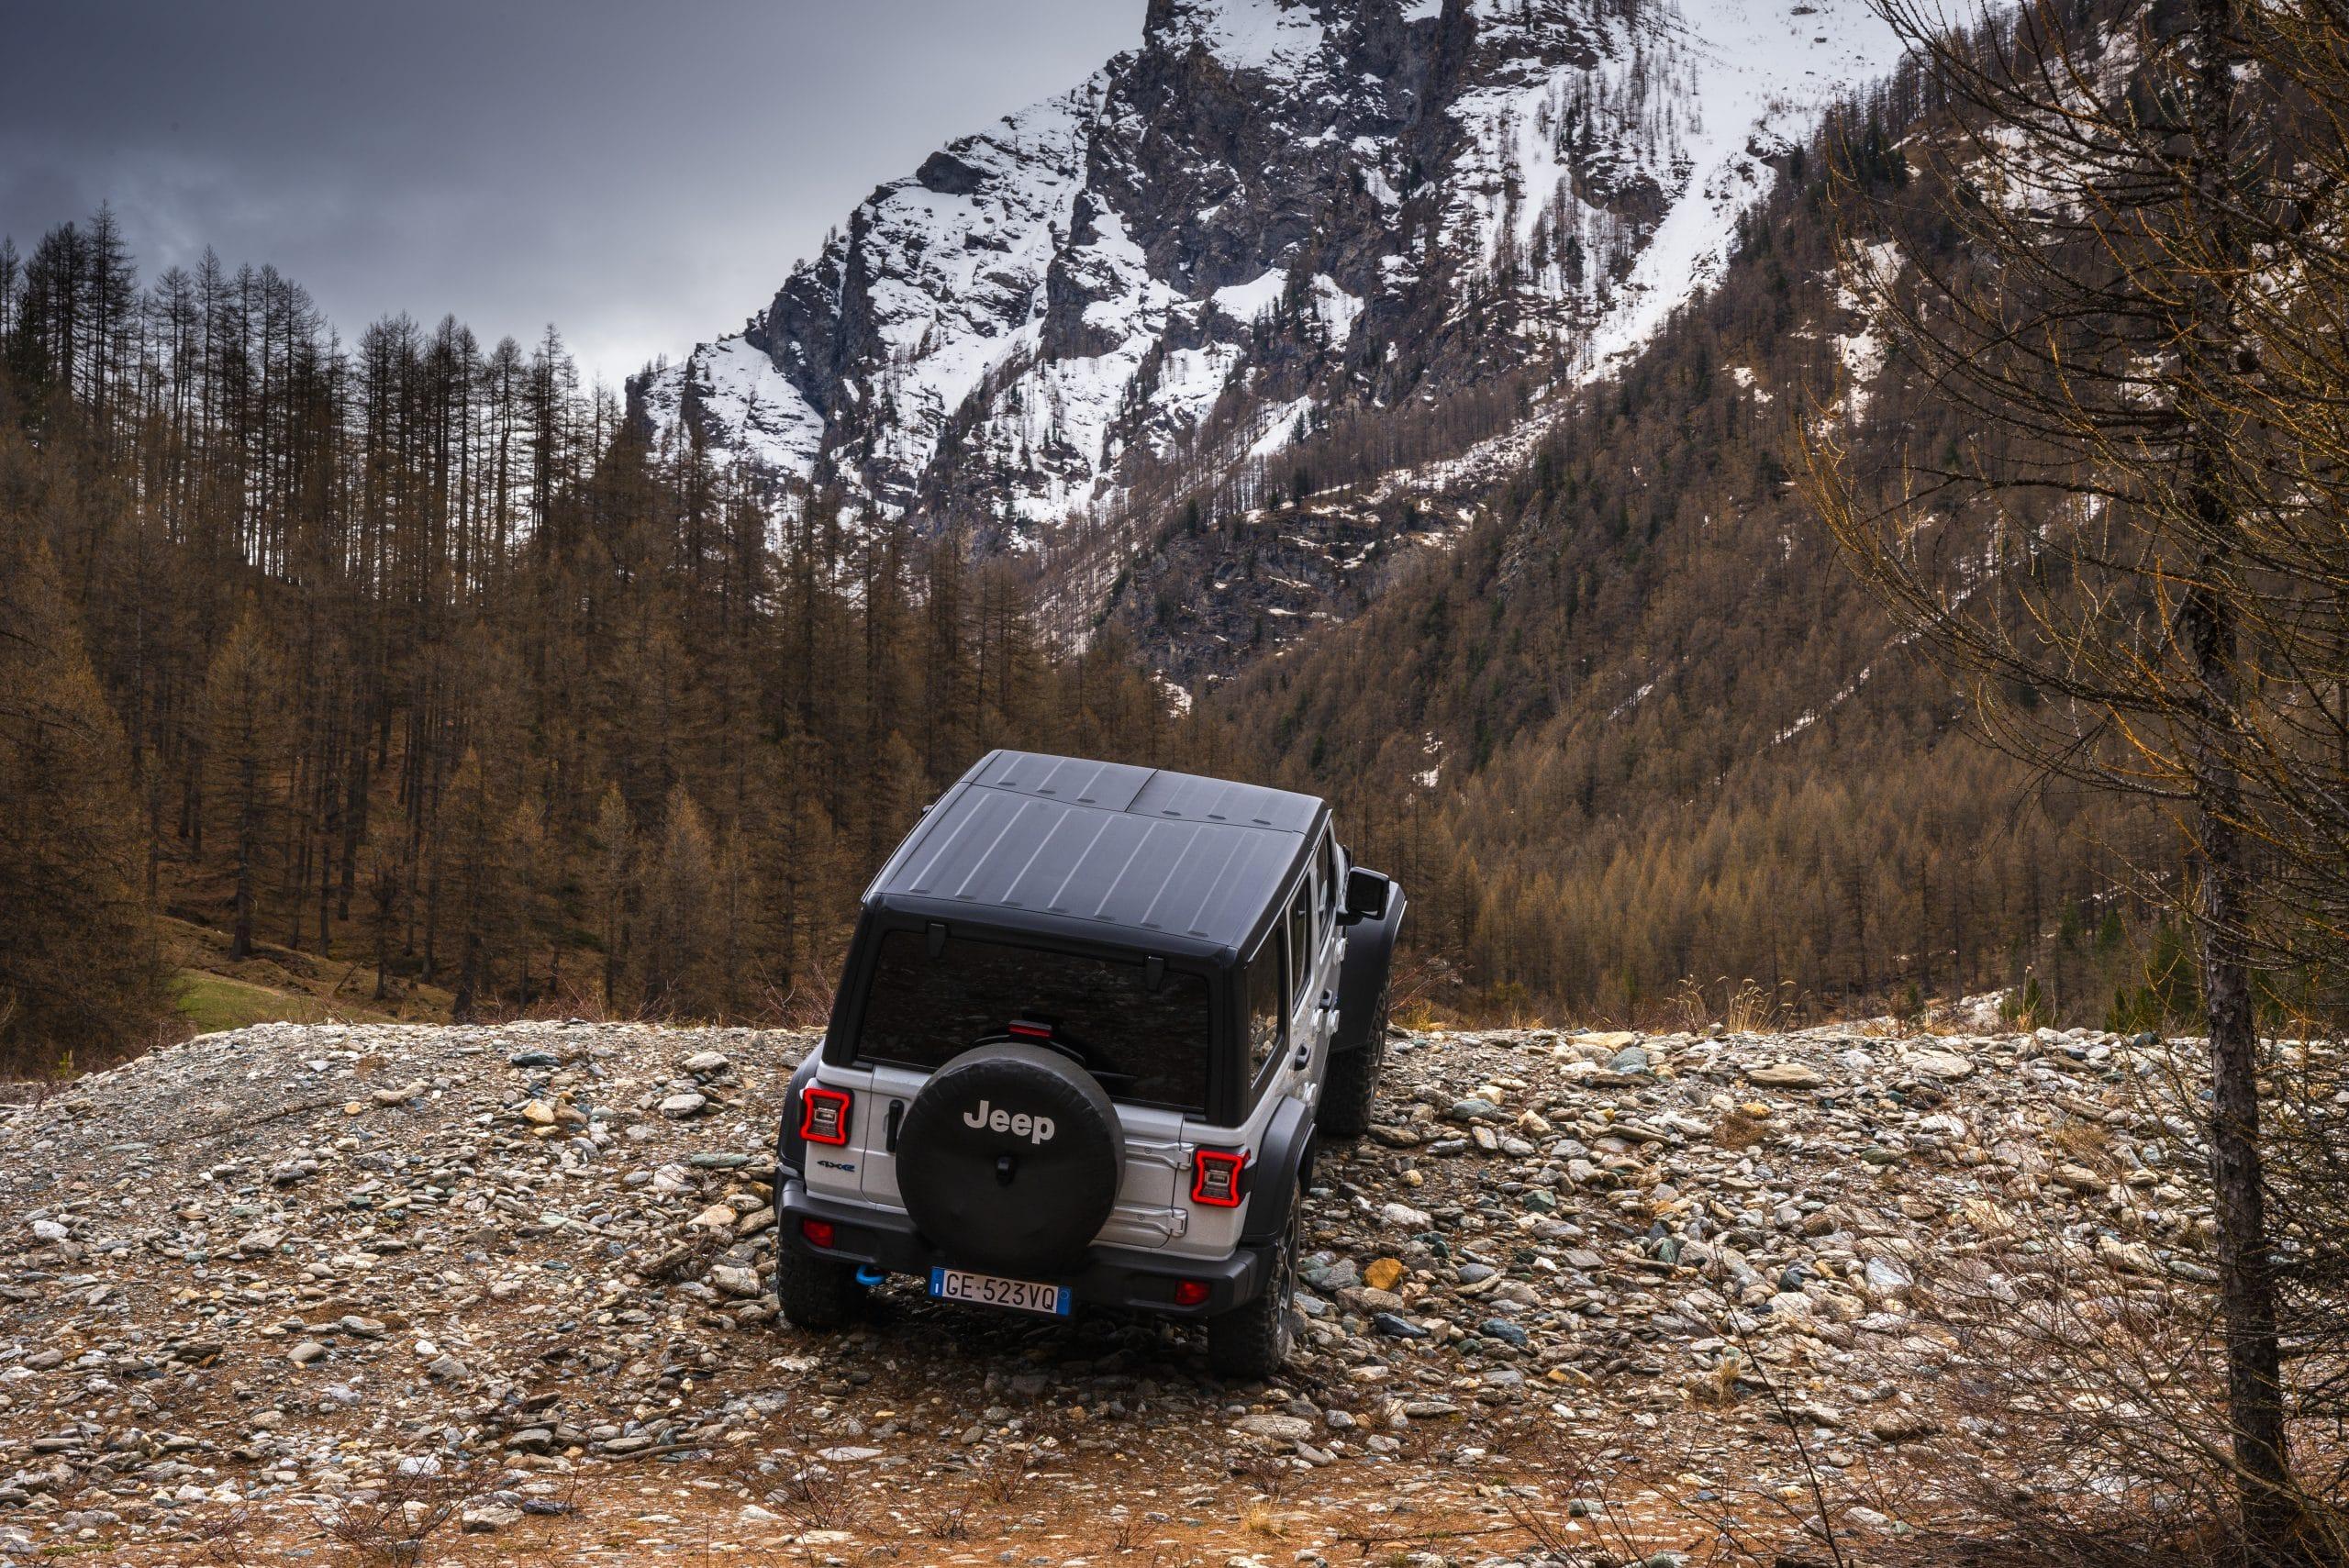 AFP9166 scaled H Jeep πρωταγωνιστεί στα φετινά OFF ROAD Magazine Awards Gladiator, Jeep, Jeep Compass, Jeep Gladiator, Jeep Renegade, Jeep Wrangler, Renegade, Wrangler, ειδήσεις, Νέα